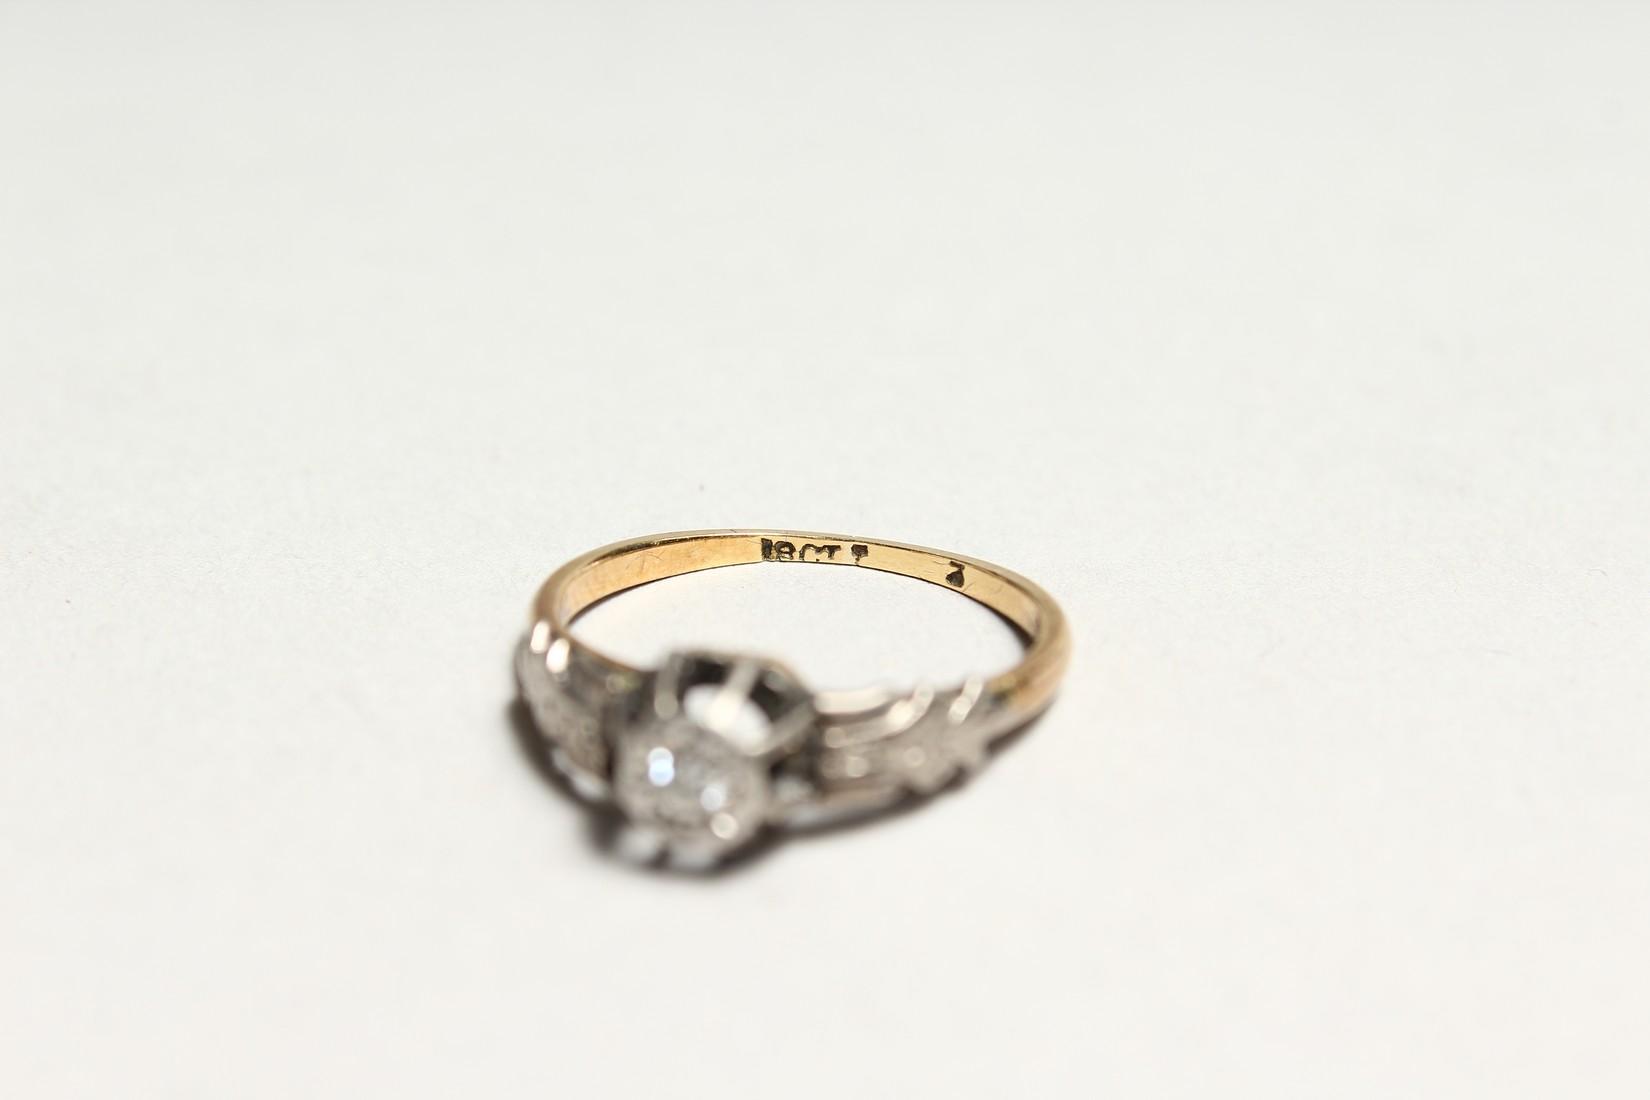 A GOOD 18CT GOLD DIAMOND SET RING - Image 5 of 5